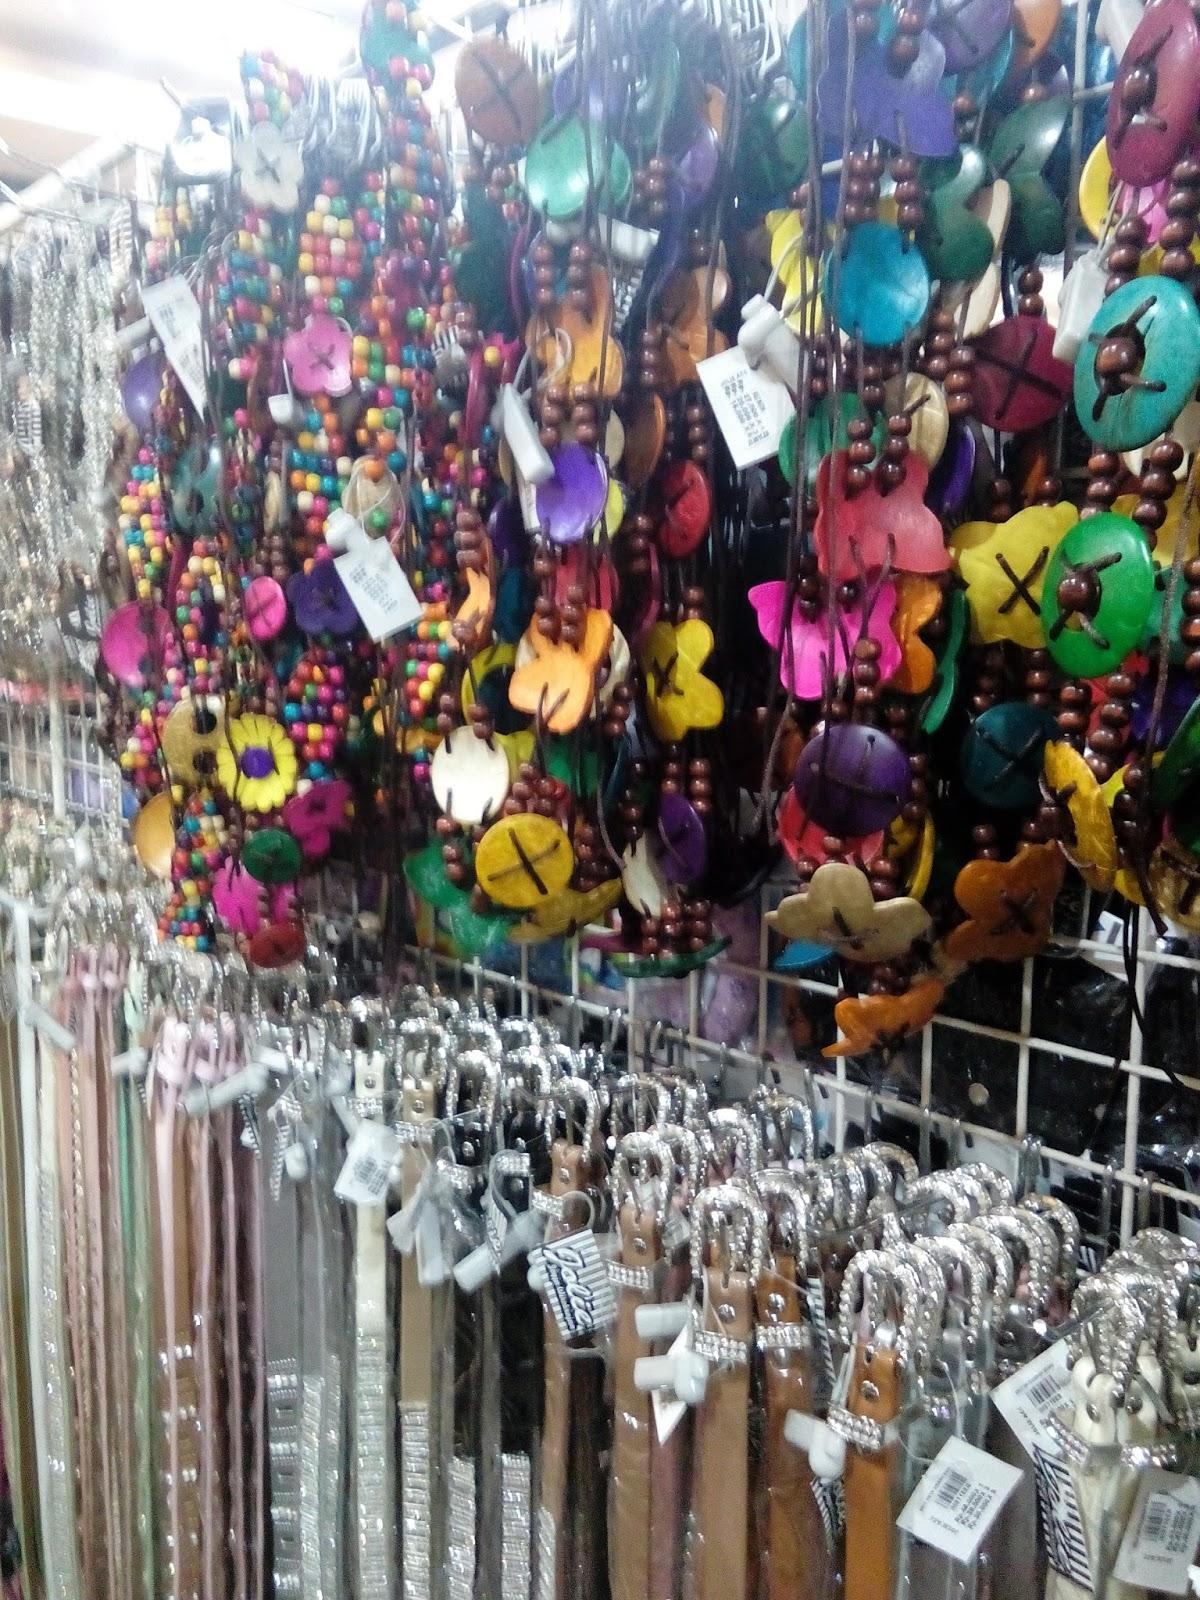 kalung warna-warni dan ikat pinggang Jolie Jogja Wirobrajan